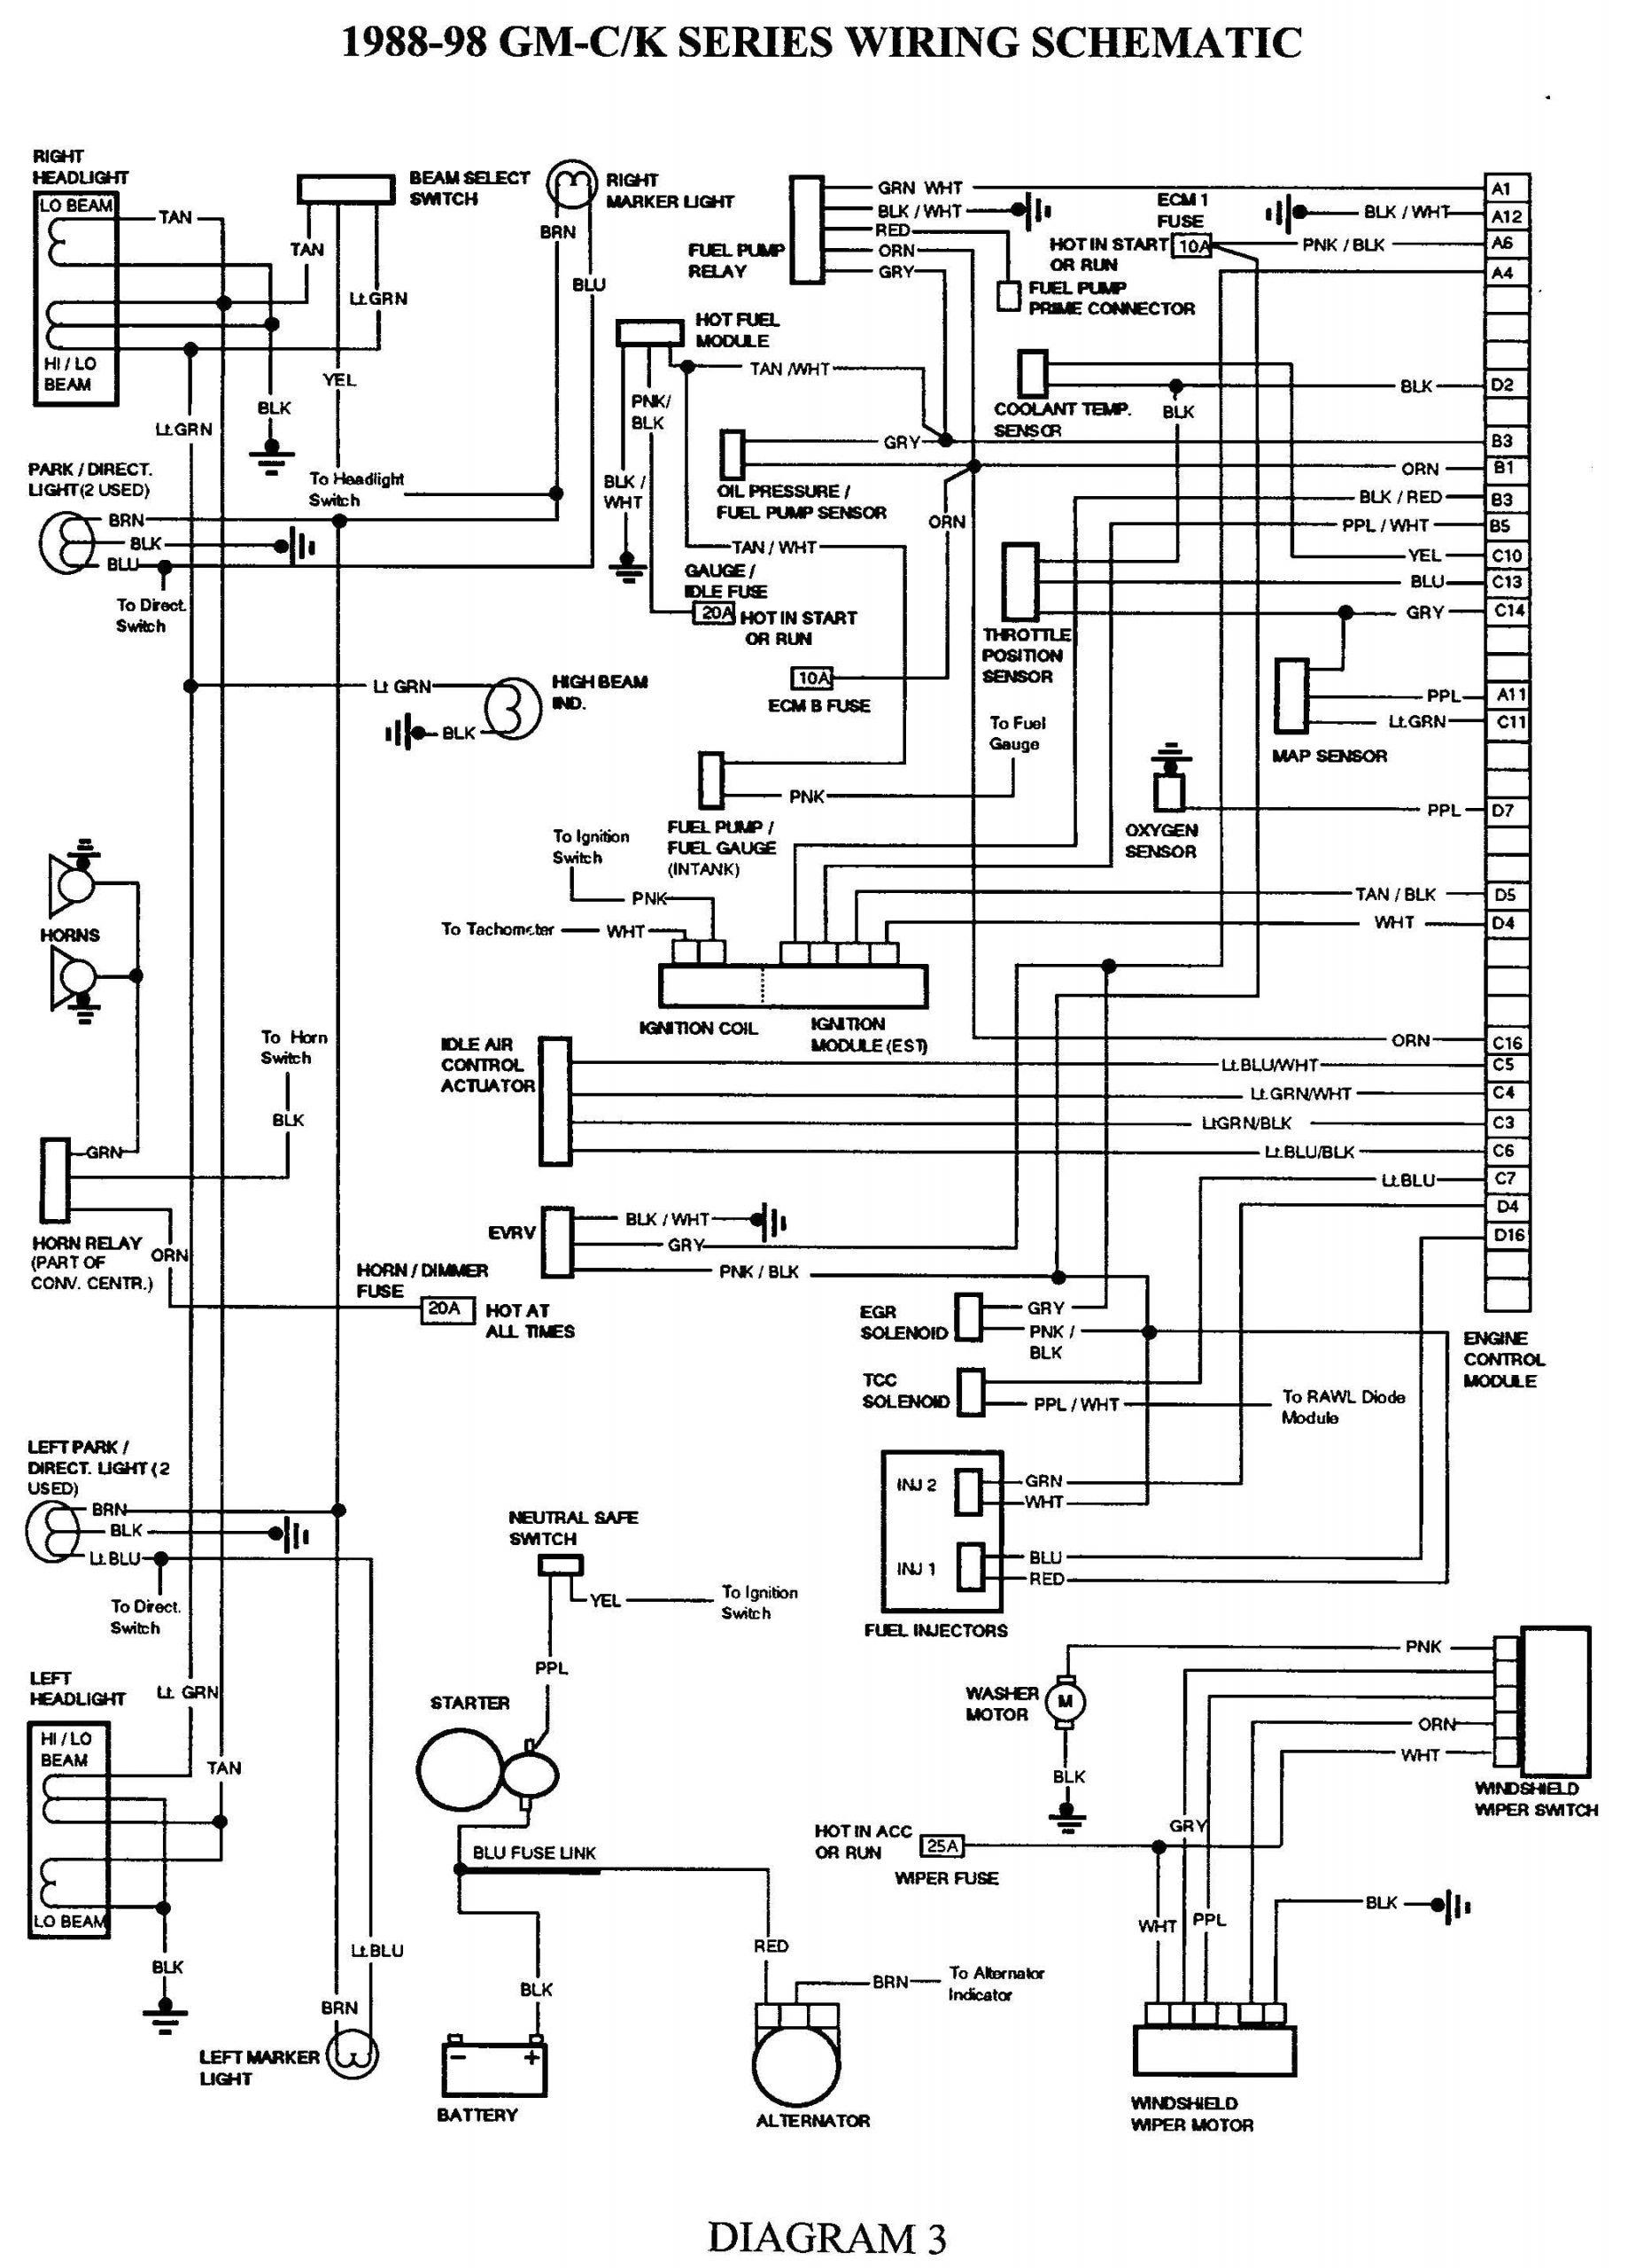 Fuel Sender Fuel Gauge Wiring Diagram 97 Chevy Z71 Wiring Diagram Wiring Diagram Data